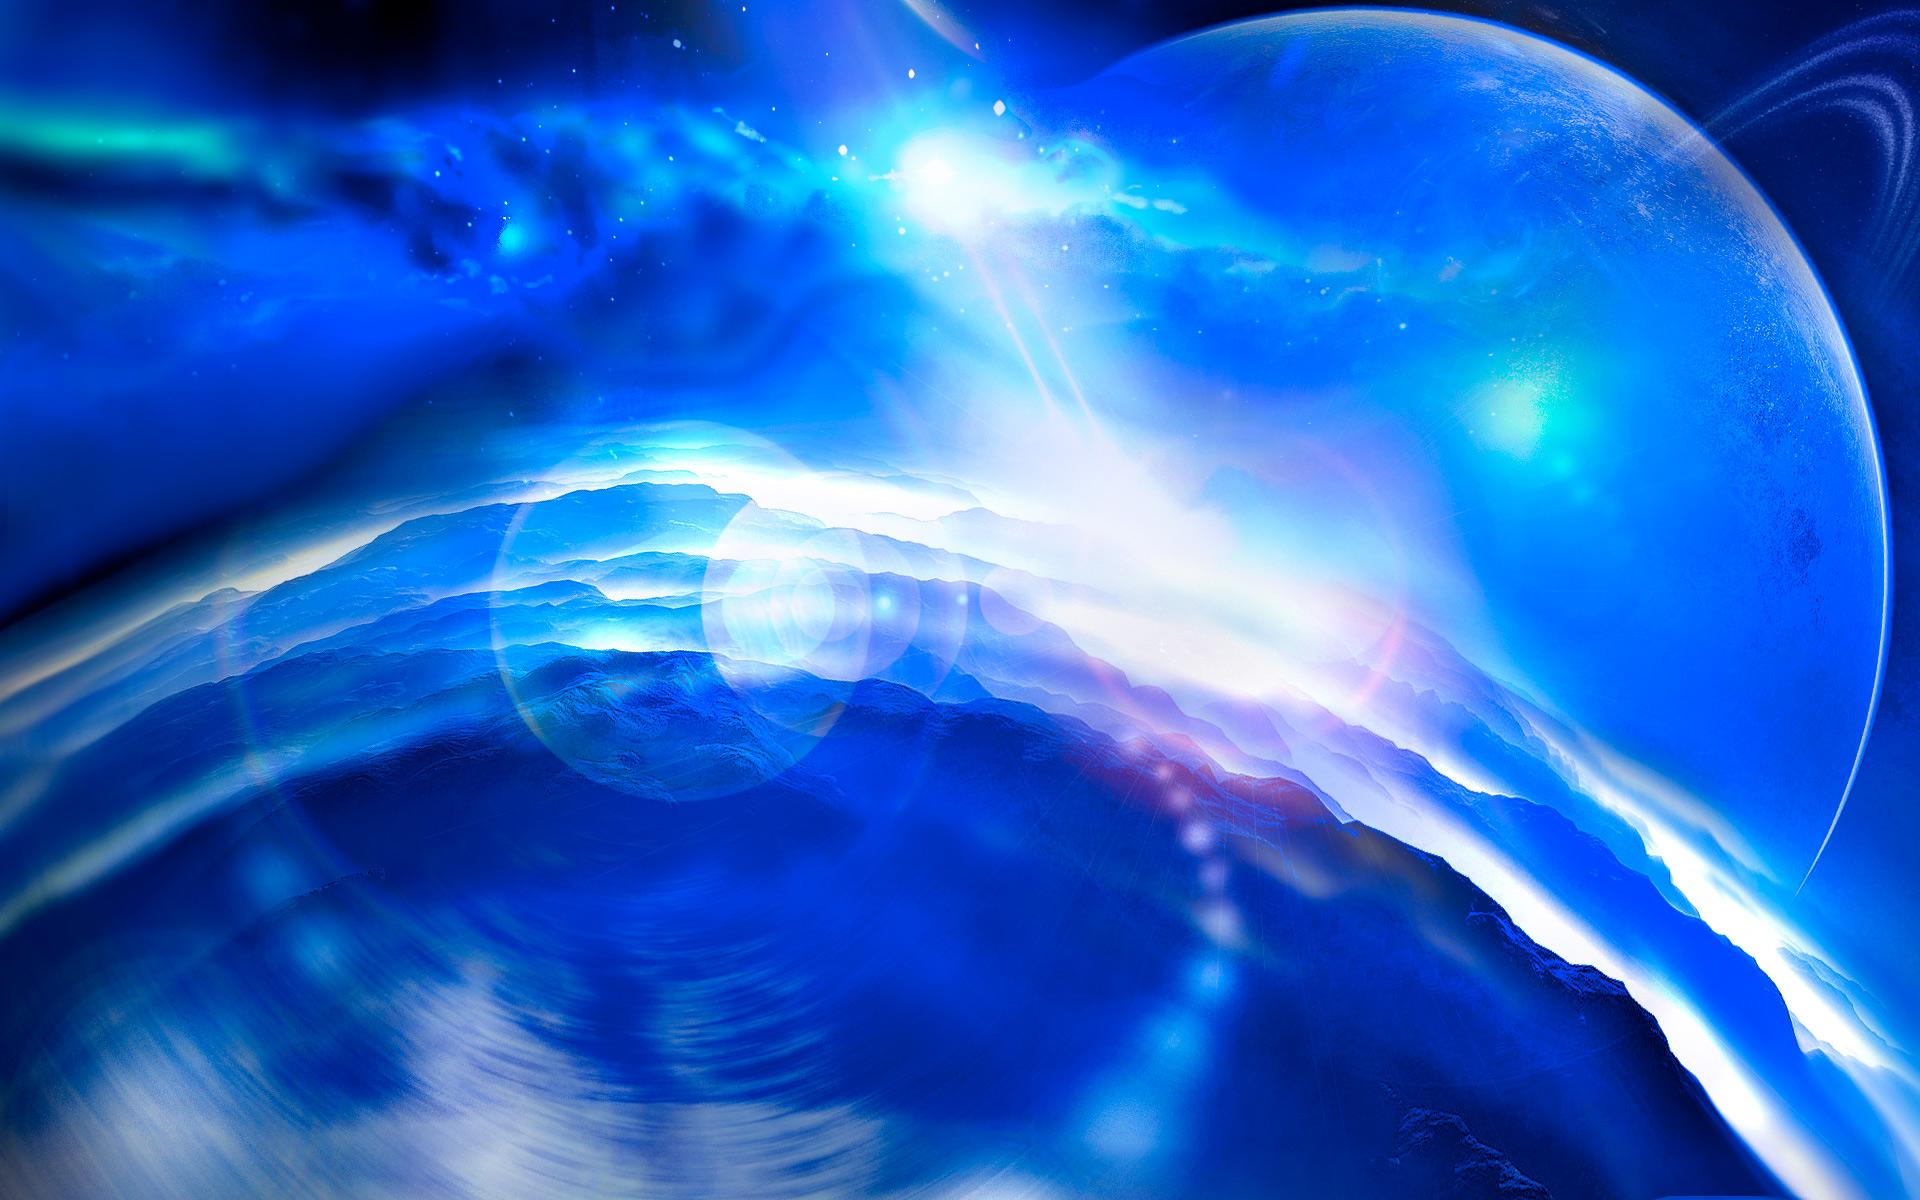 Blue planet wallpaper wallpapersafari - Blue space hd ...